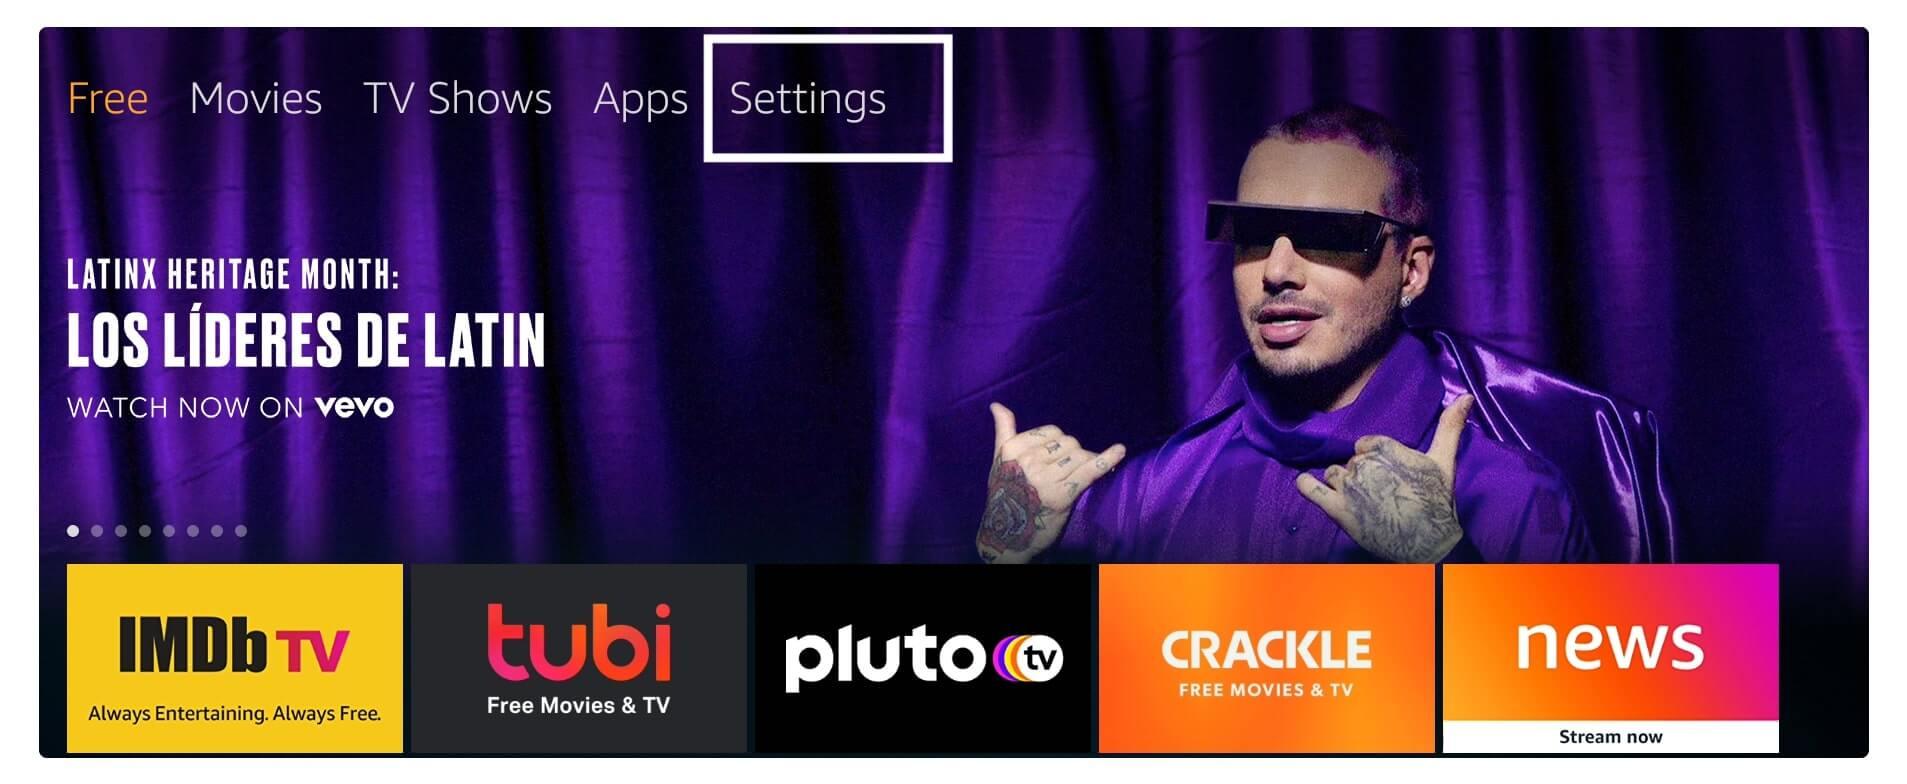 Install-Cyberflix-TV-APK-On-Firestick